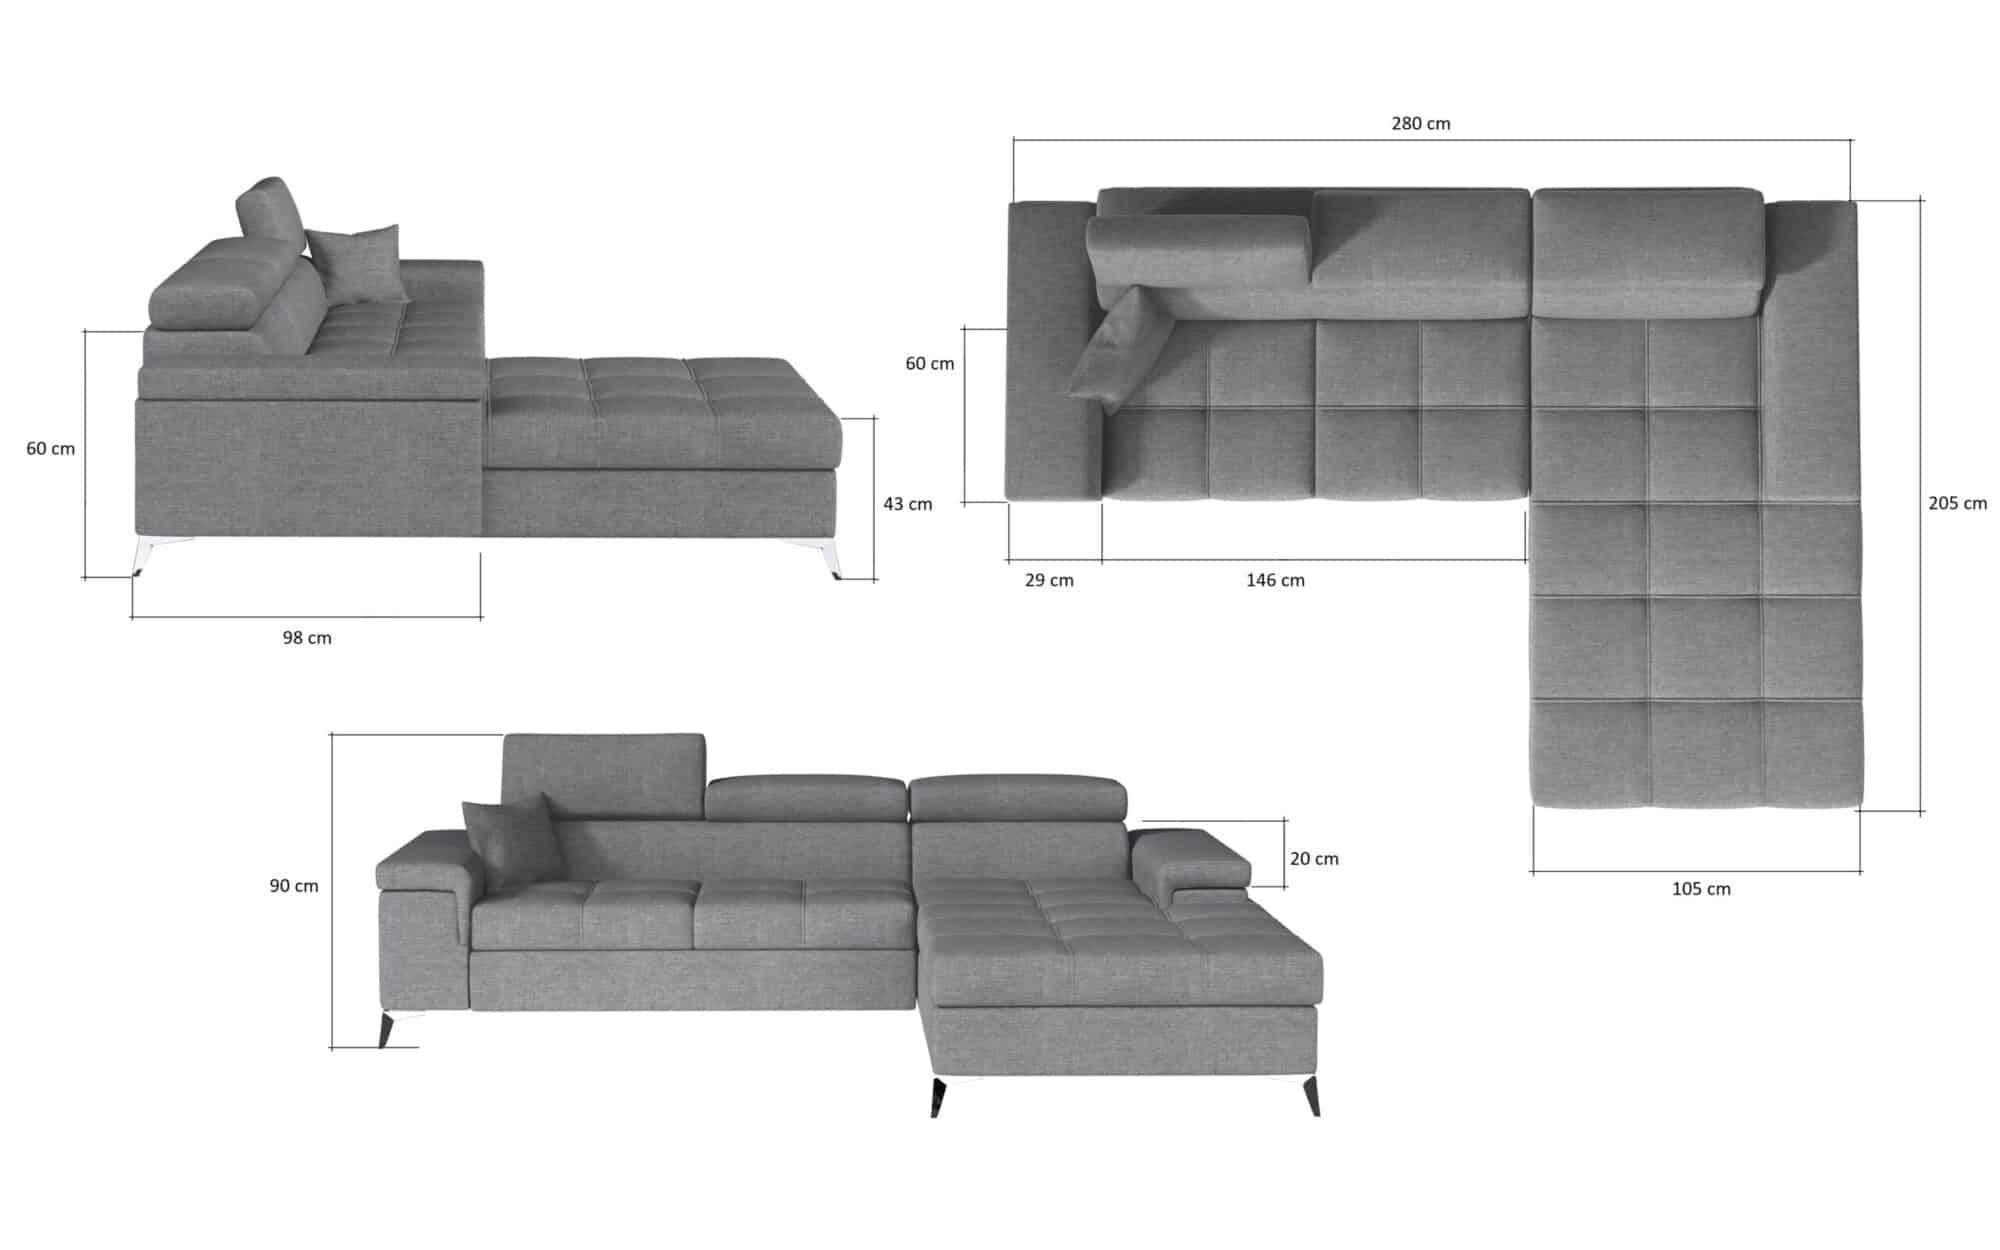 Concept One chaiselong sovesofa billedet med mål